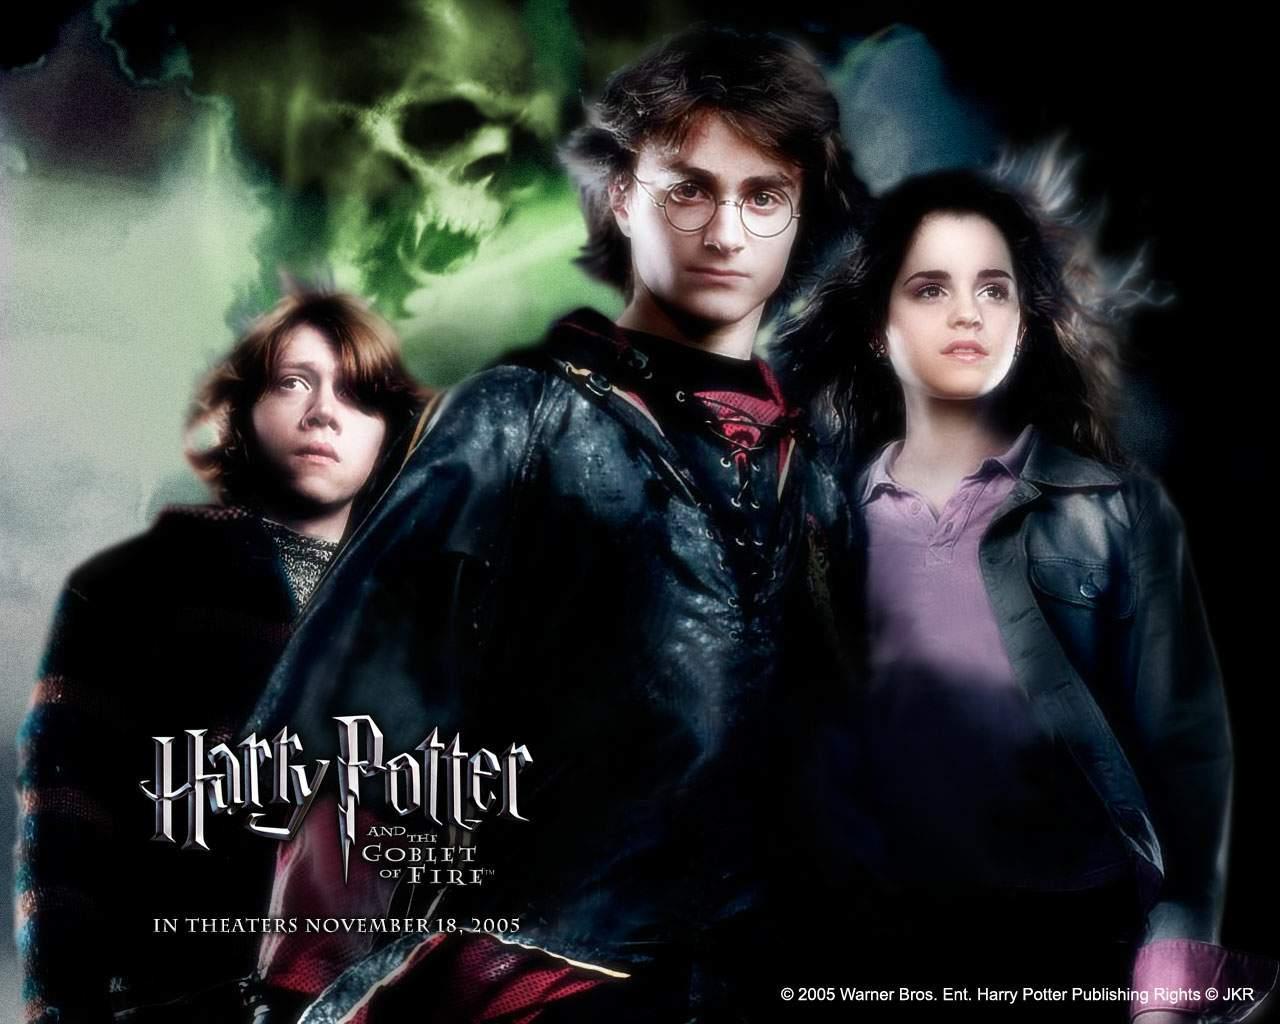 Bibi J Harry Potter Movies Wallpapers Hd Harry Potter Games